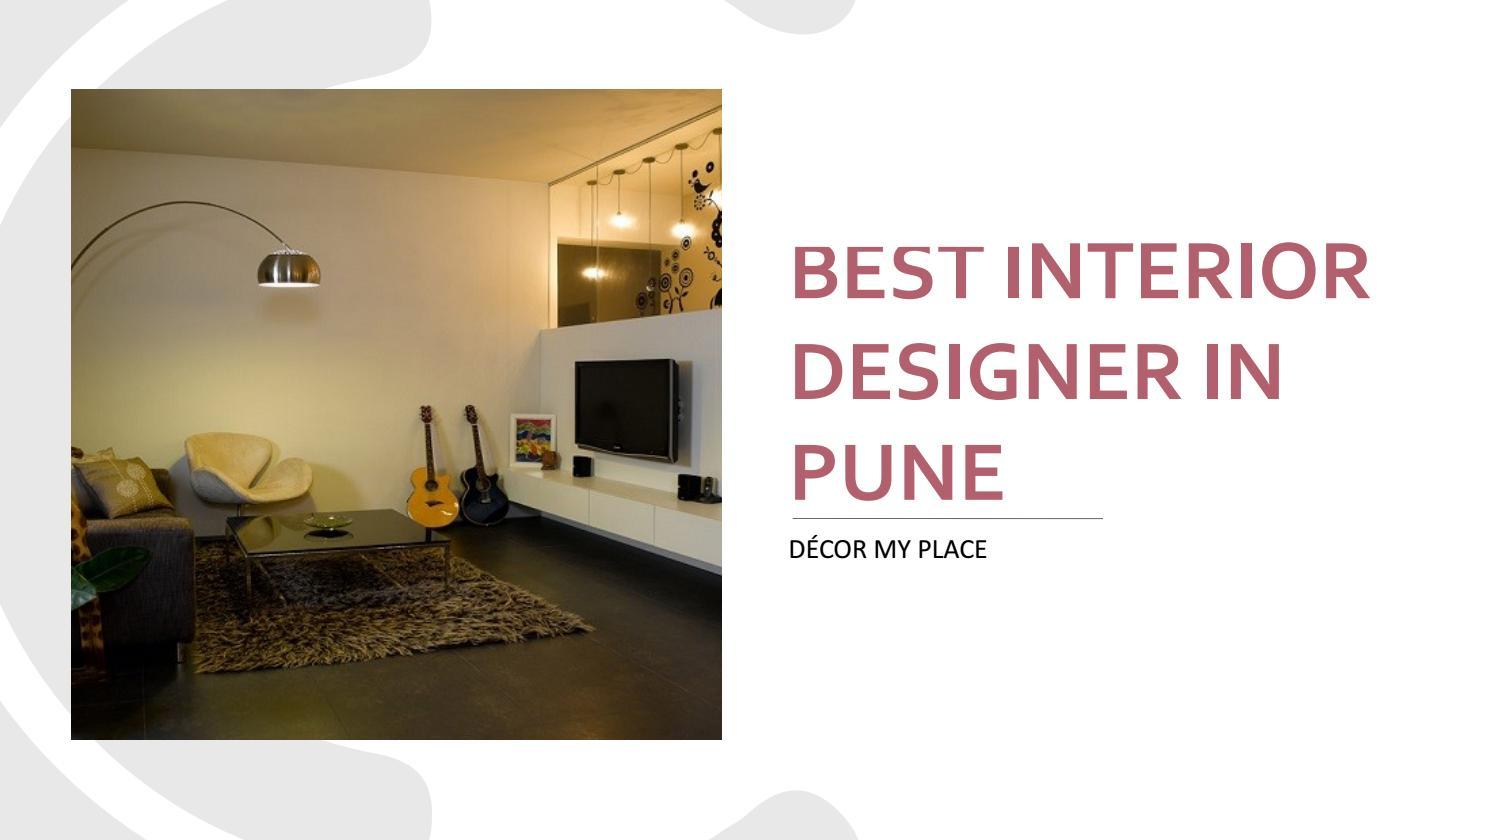 2 Bhk Interior Design Cost Pune 2 Bhk Interior Designing Cost Pune Decor My Place By Anvi Patil63 Issuu